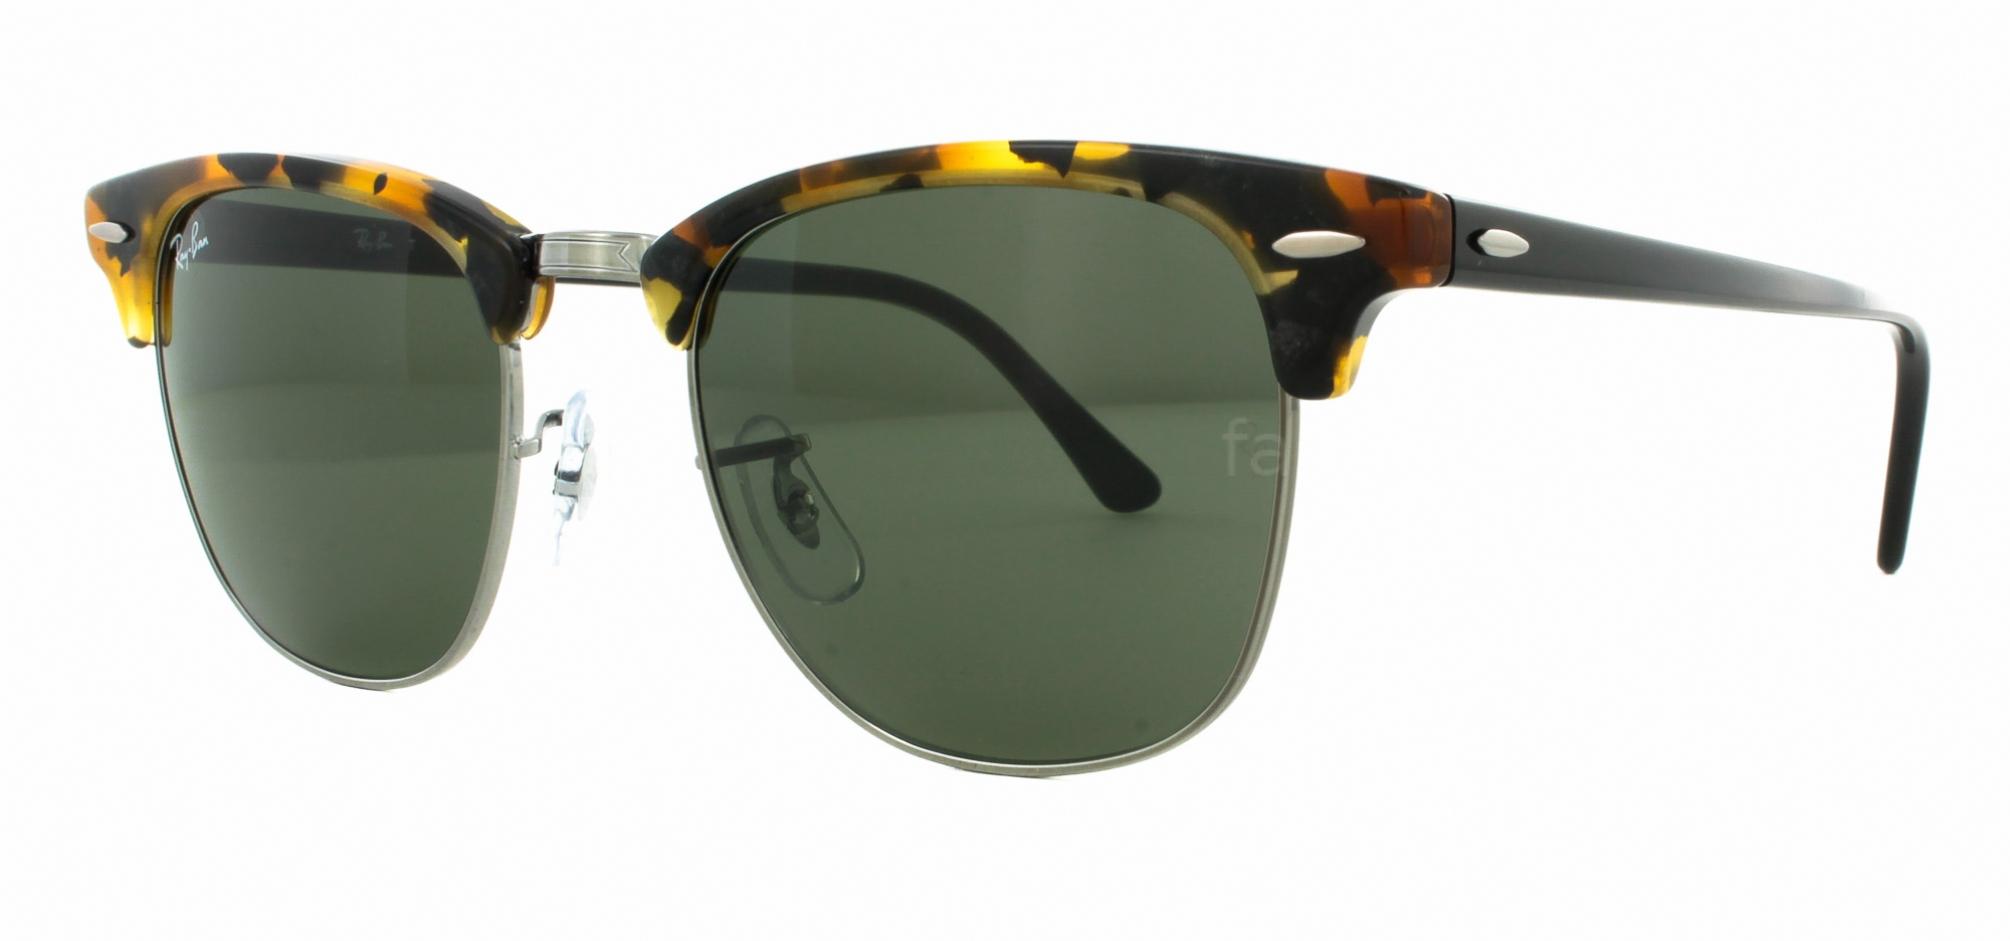 dd35f0b4a7e Ray Ban Sunglasses Rb3293 Reviews